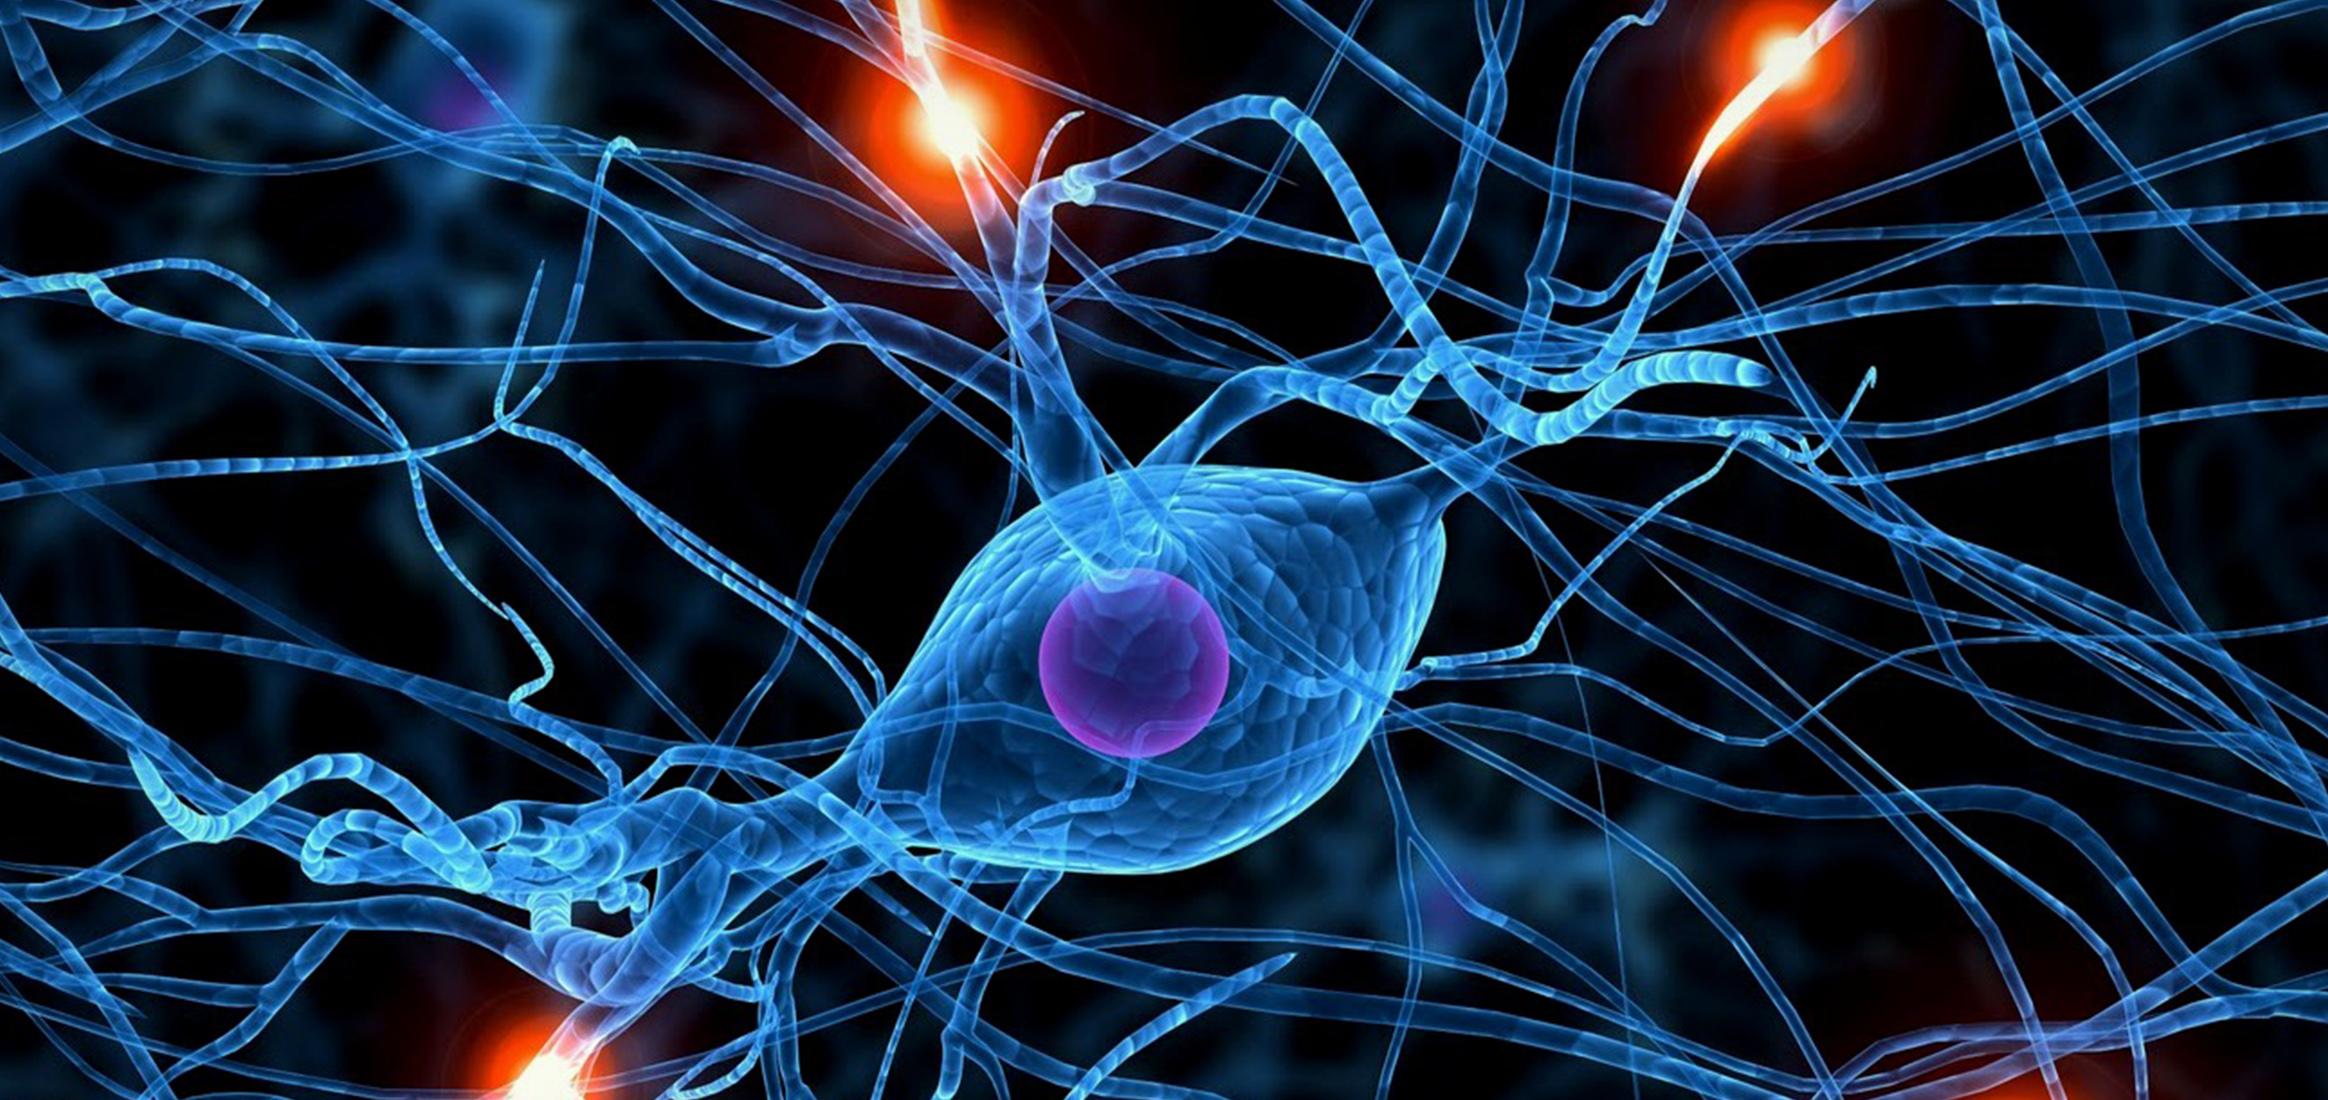 Nerve, Synapse, Axon, Neuron